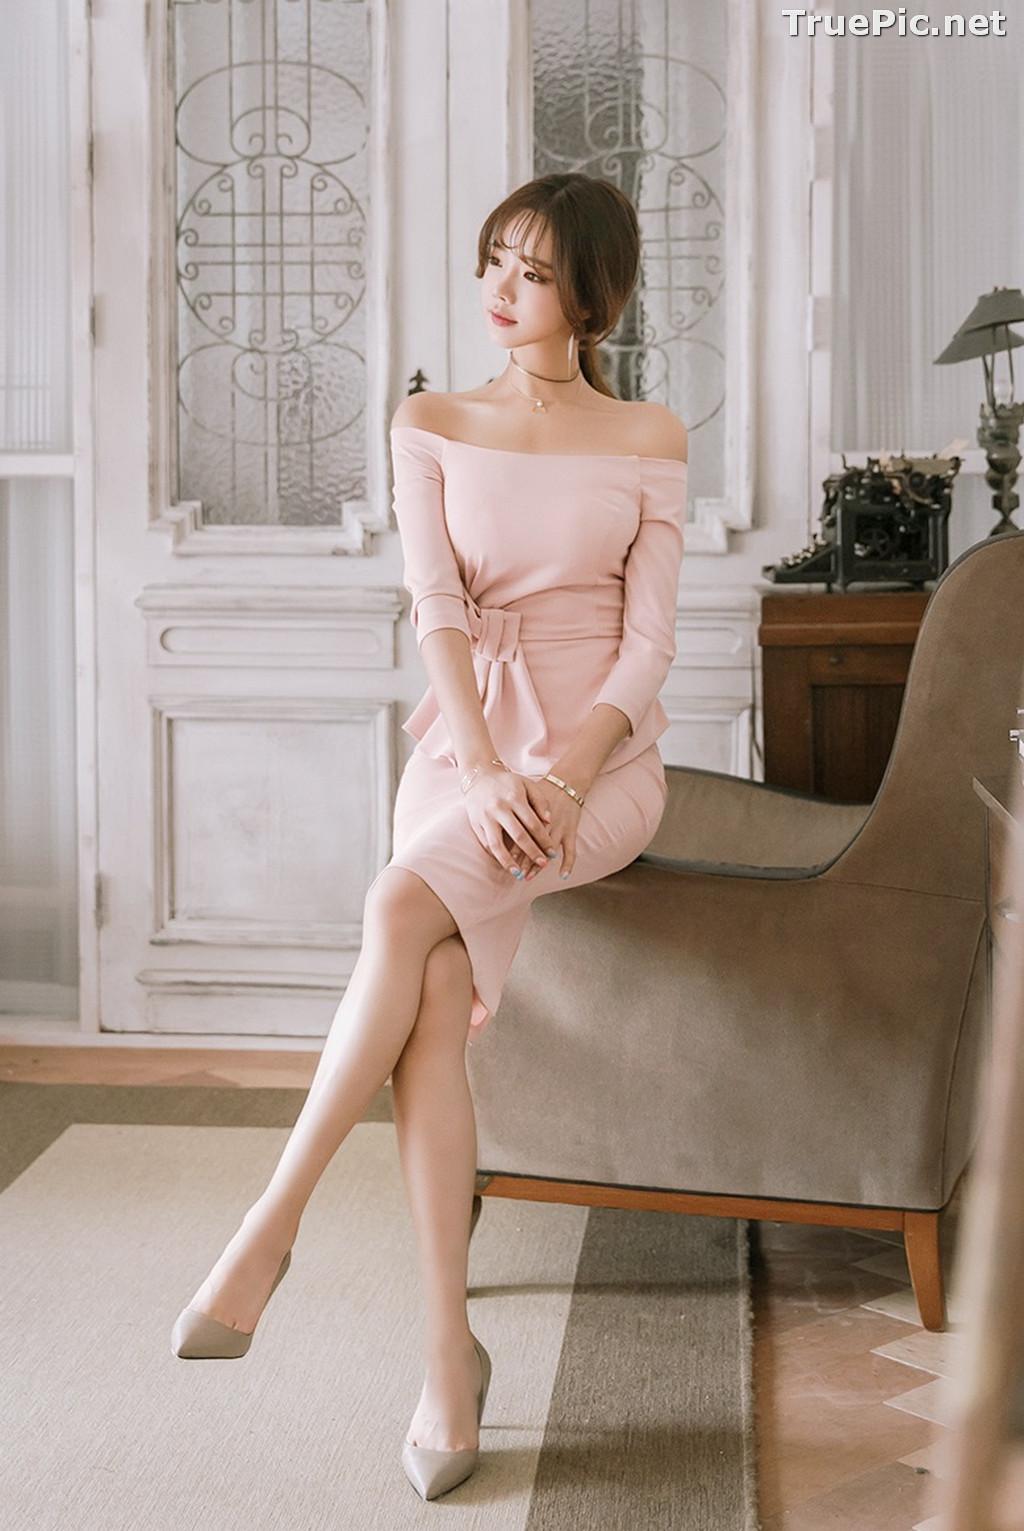 Image Korean Fashion Model - Kang Eun Wook - Slim Fit Bodycon Dress - TruePic.net - Picture-6